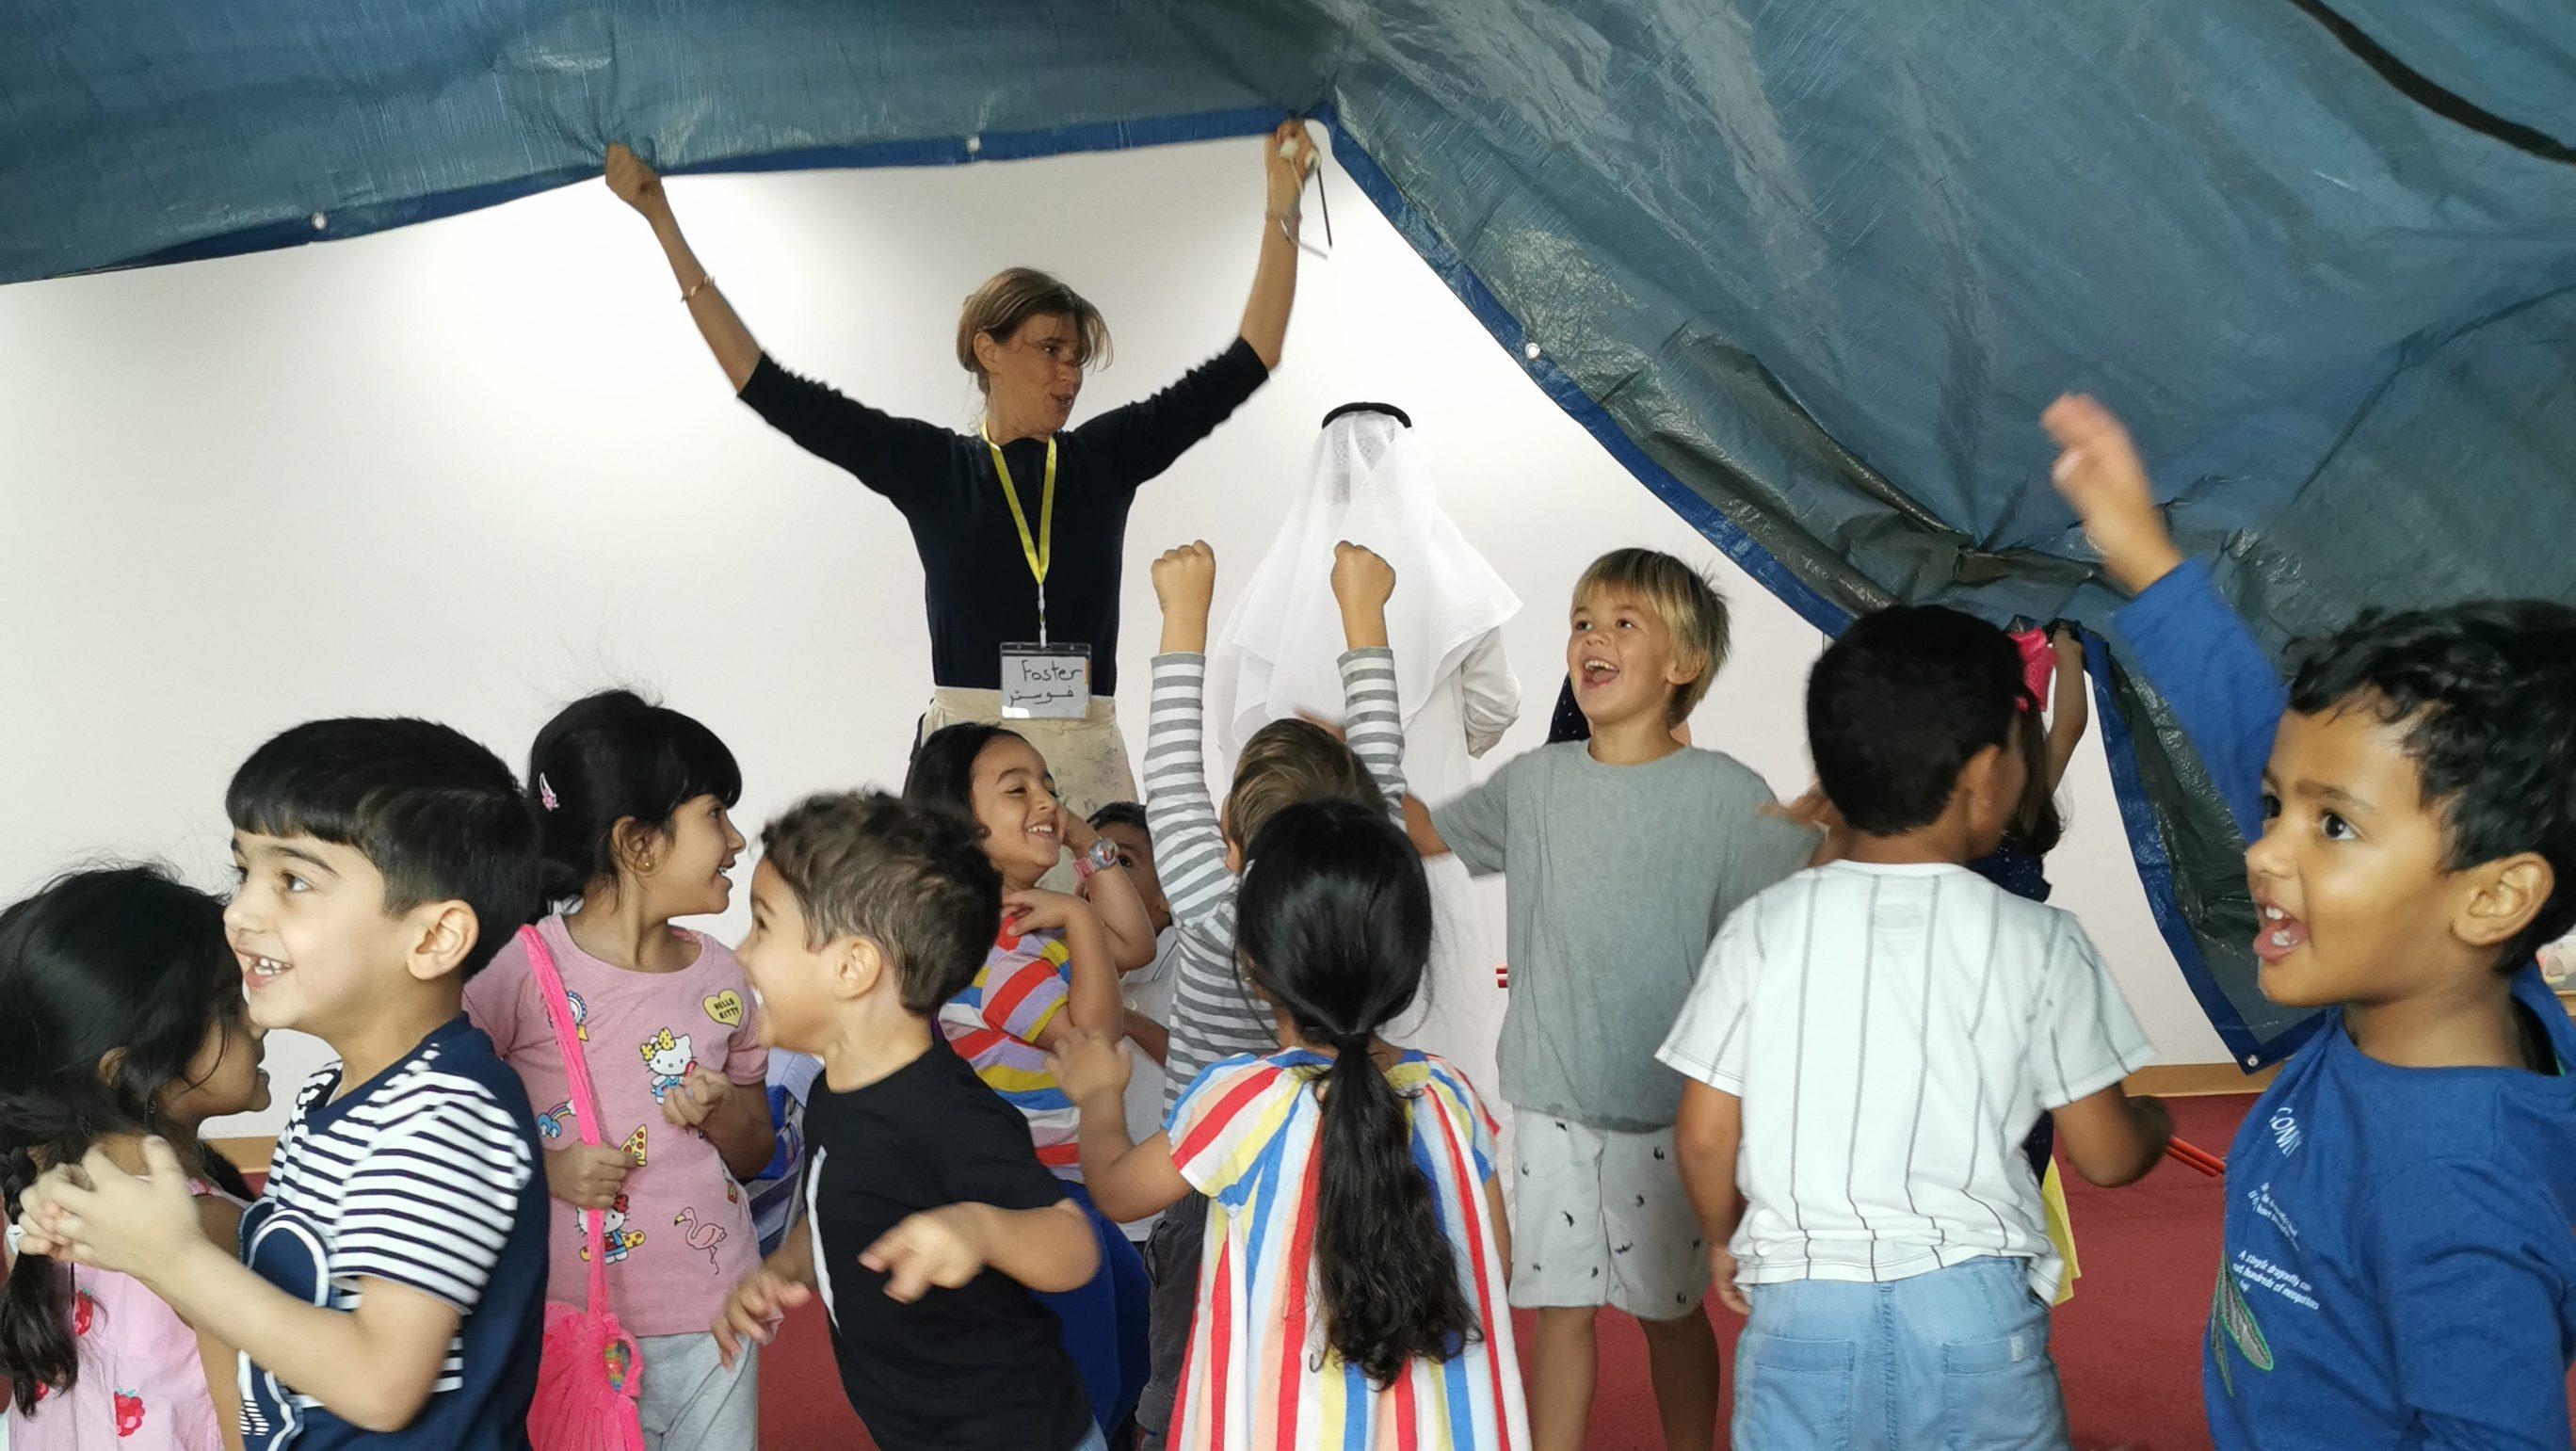 Empathy In Action How Teachers Prepare >> Academyati Preschool In Qatar Shows How To Teach Empathy